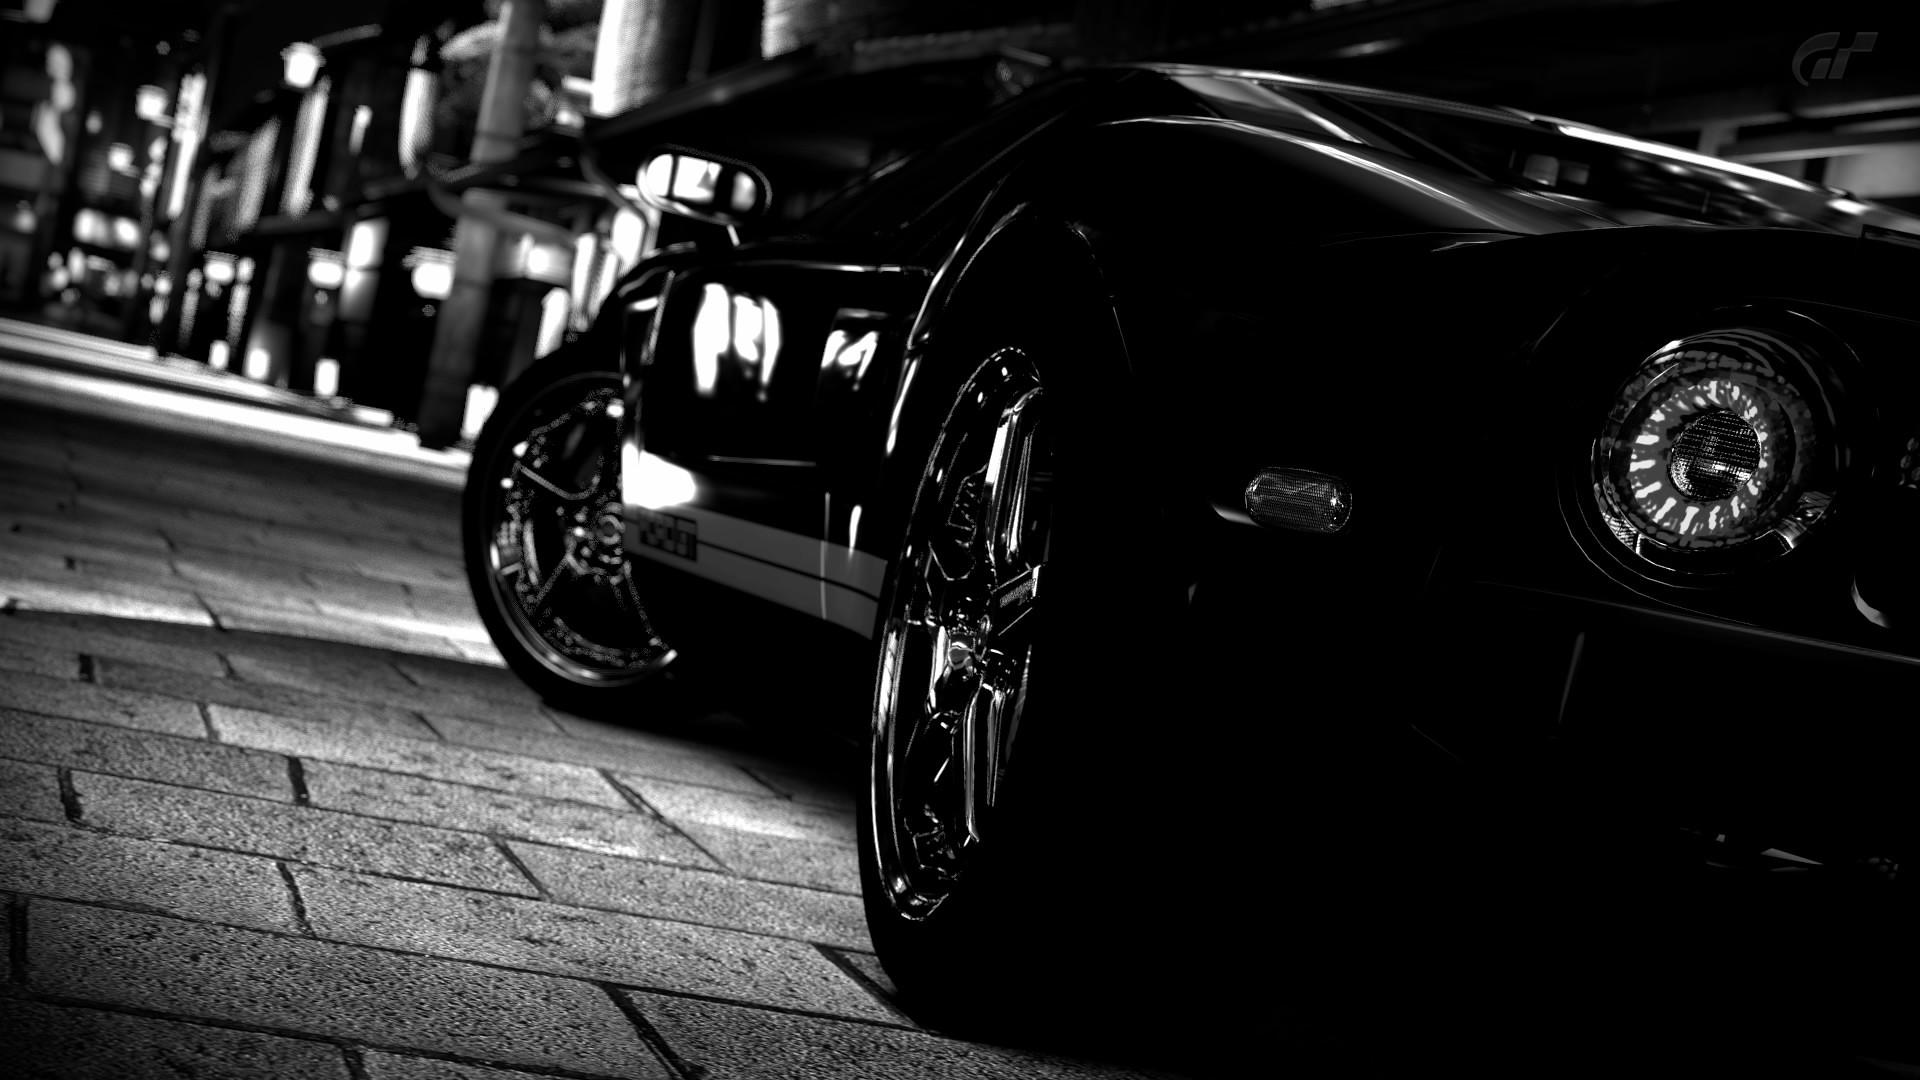 cars ford mustang shelby gt500. Black Car Wallpaper Hd 1920x1080 Wallpaper Teahub Io